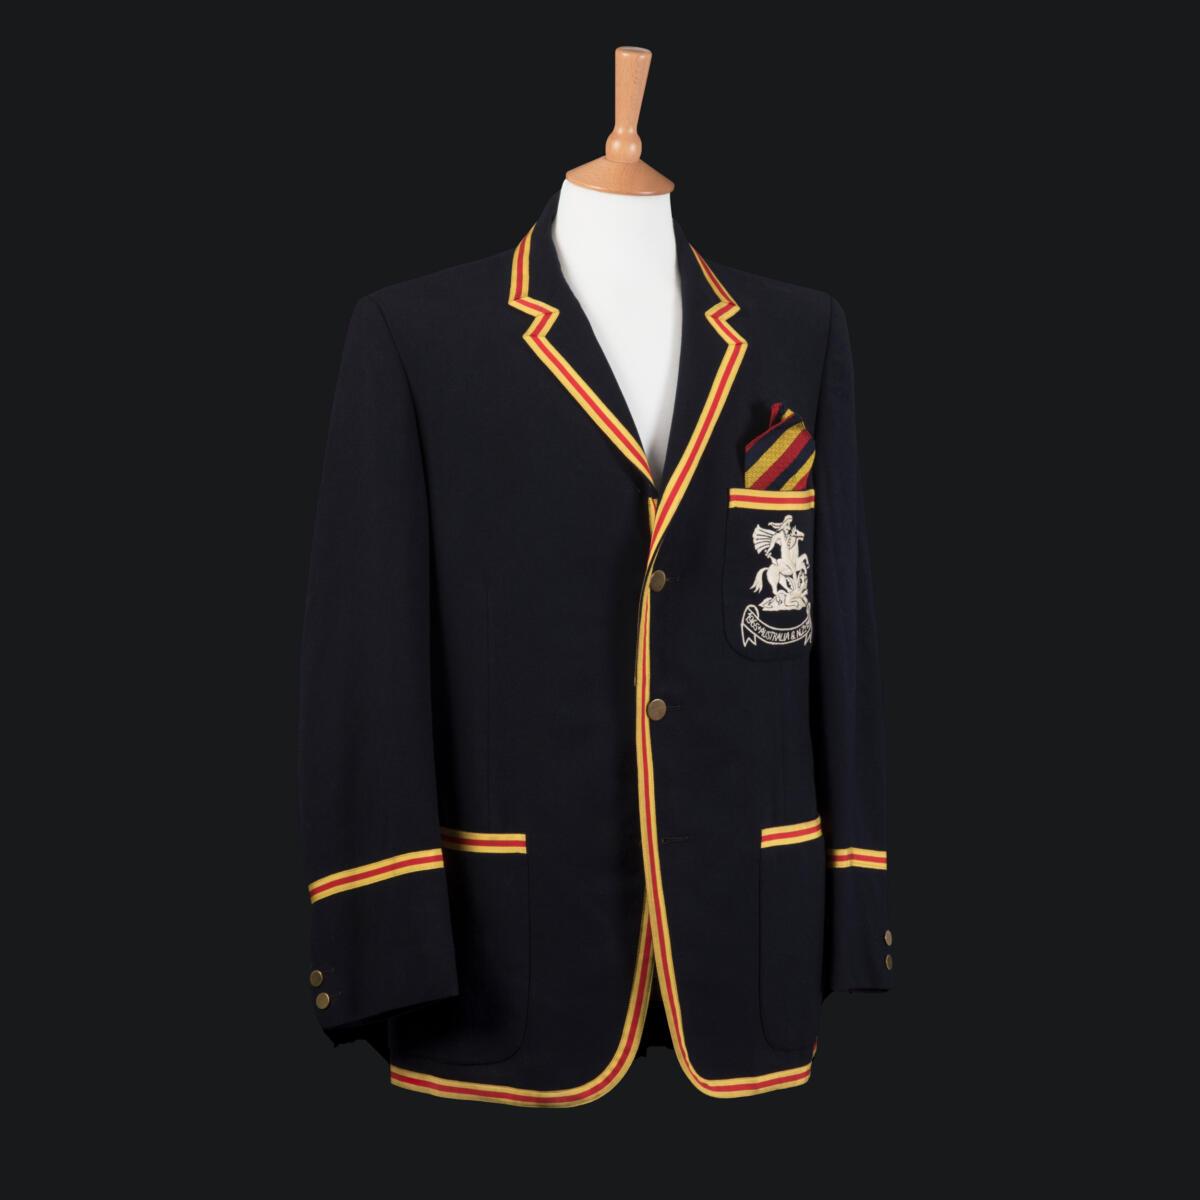 Blazer and MCC Touring Tie: England Tour to Australia and New Zealand 1965/66.Gift of David Allen